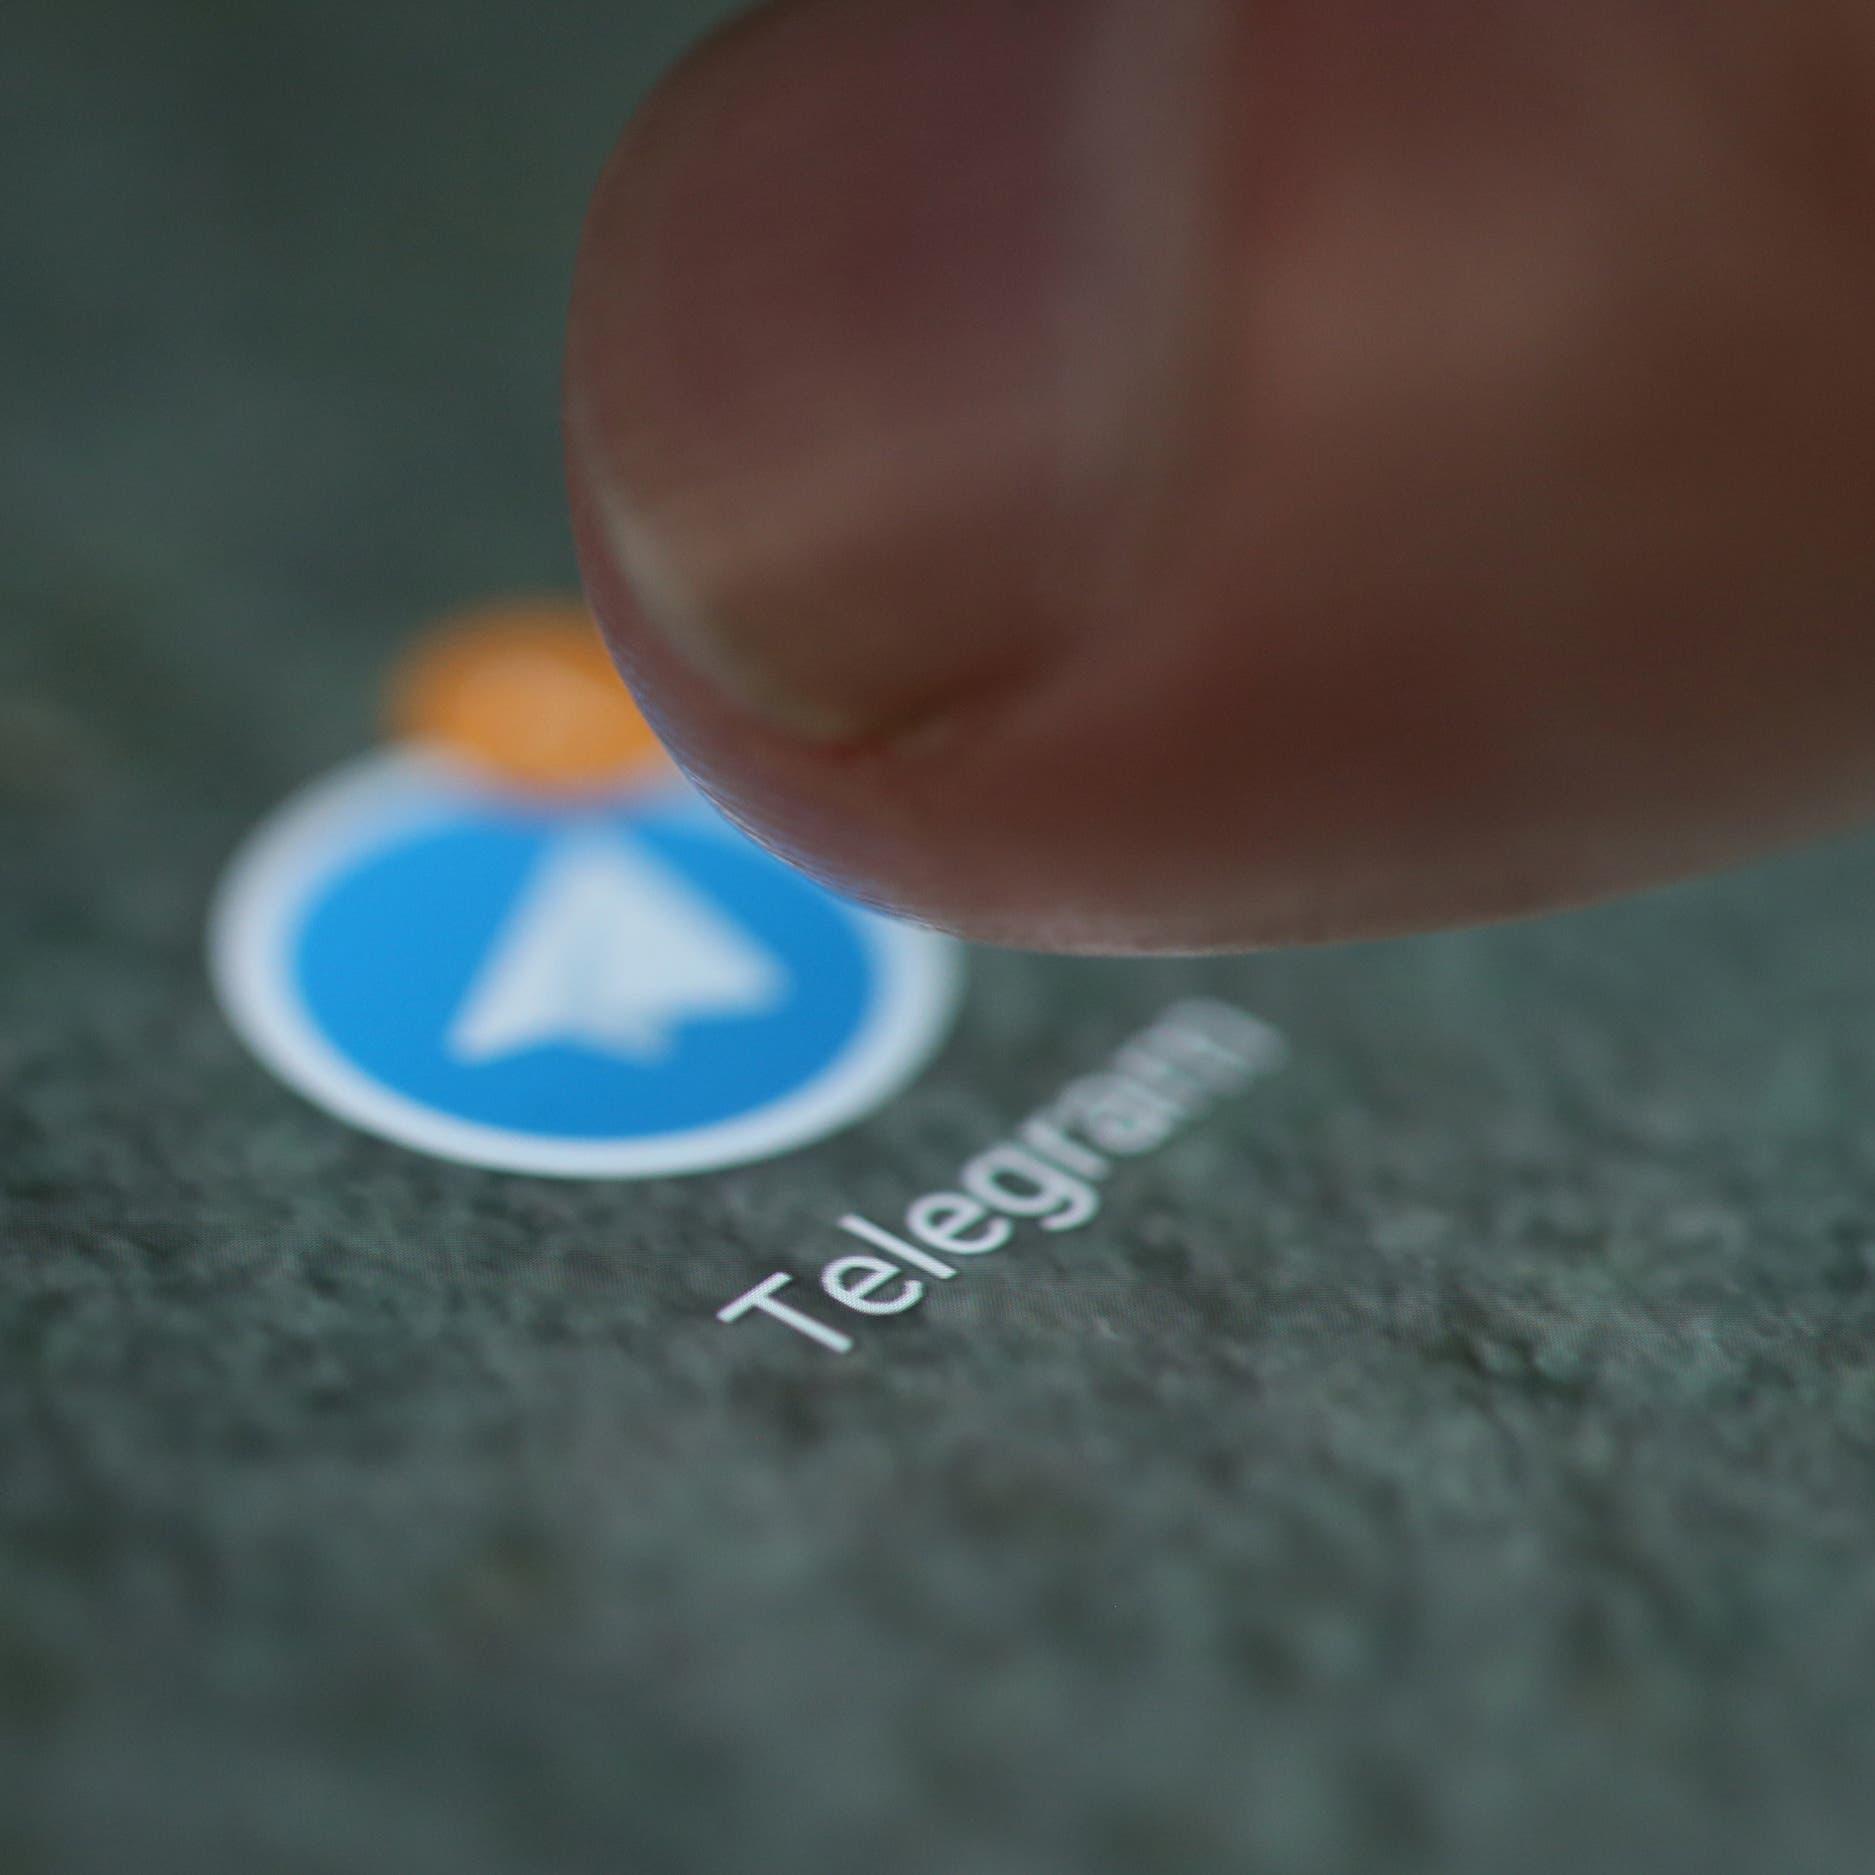 Italian police block Telegram groups due to fake COVID health pass schemes